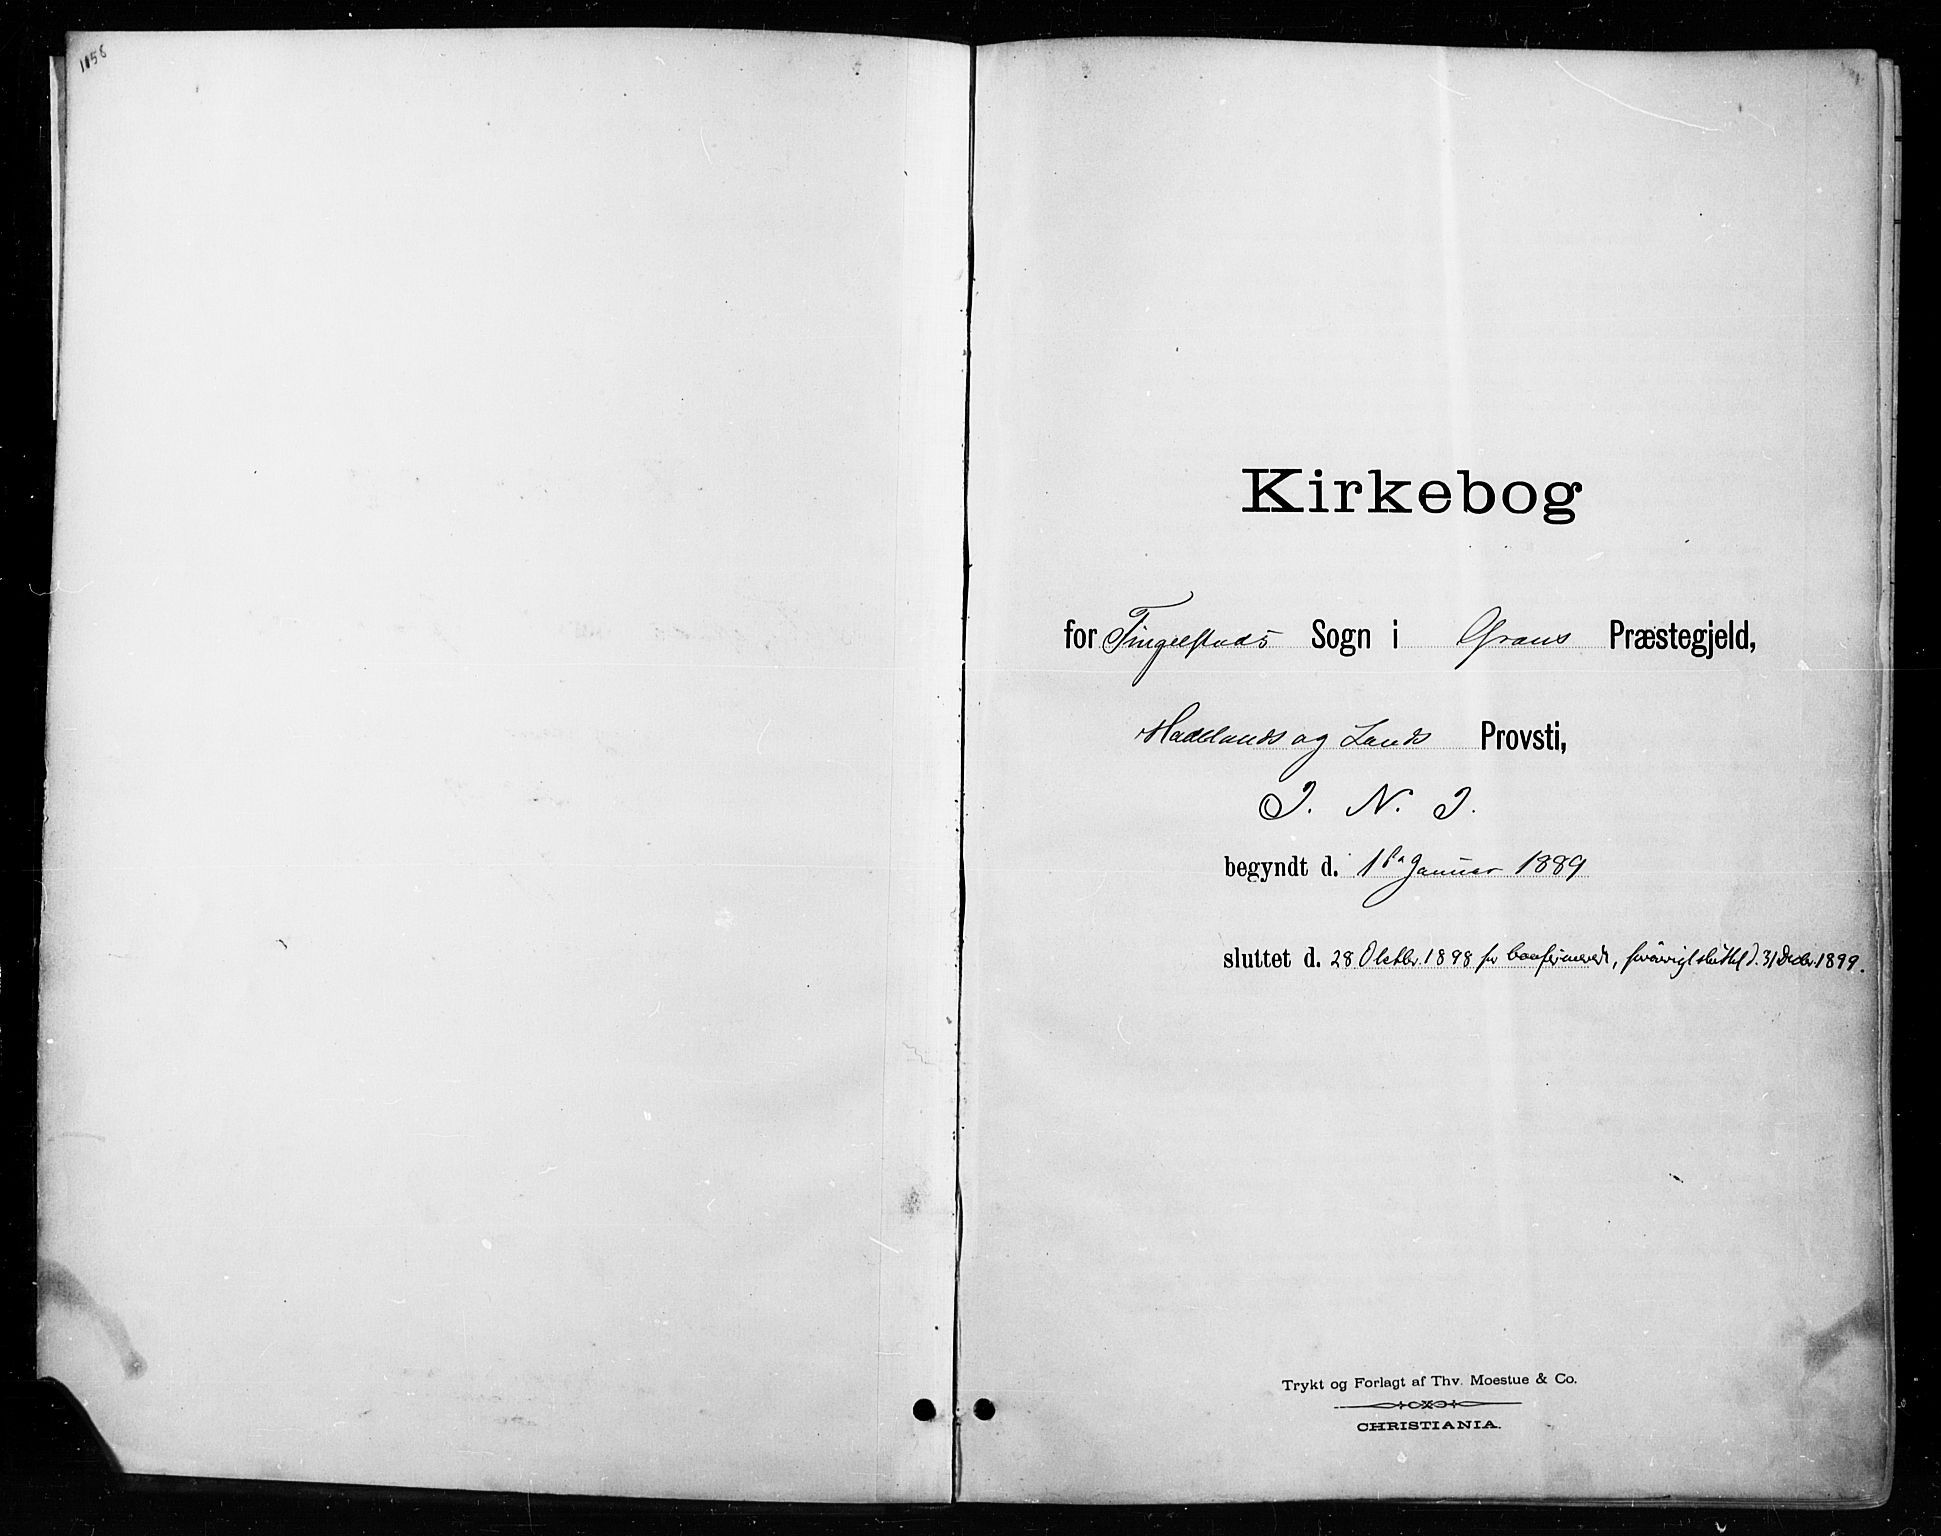 SAH, Gran prestekontor, Ministerialbok nr. 18, 1889-1899